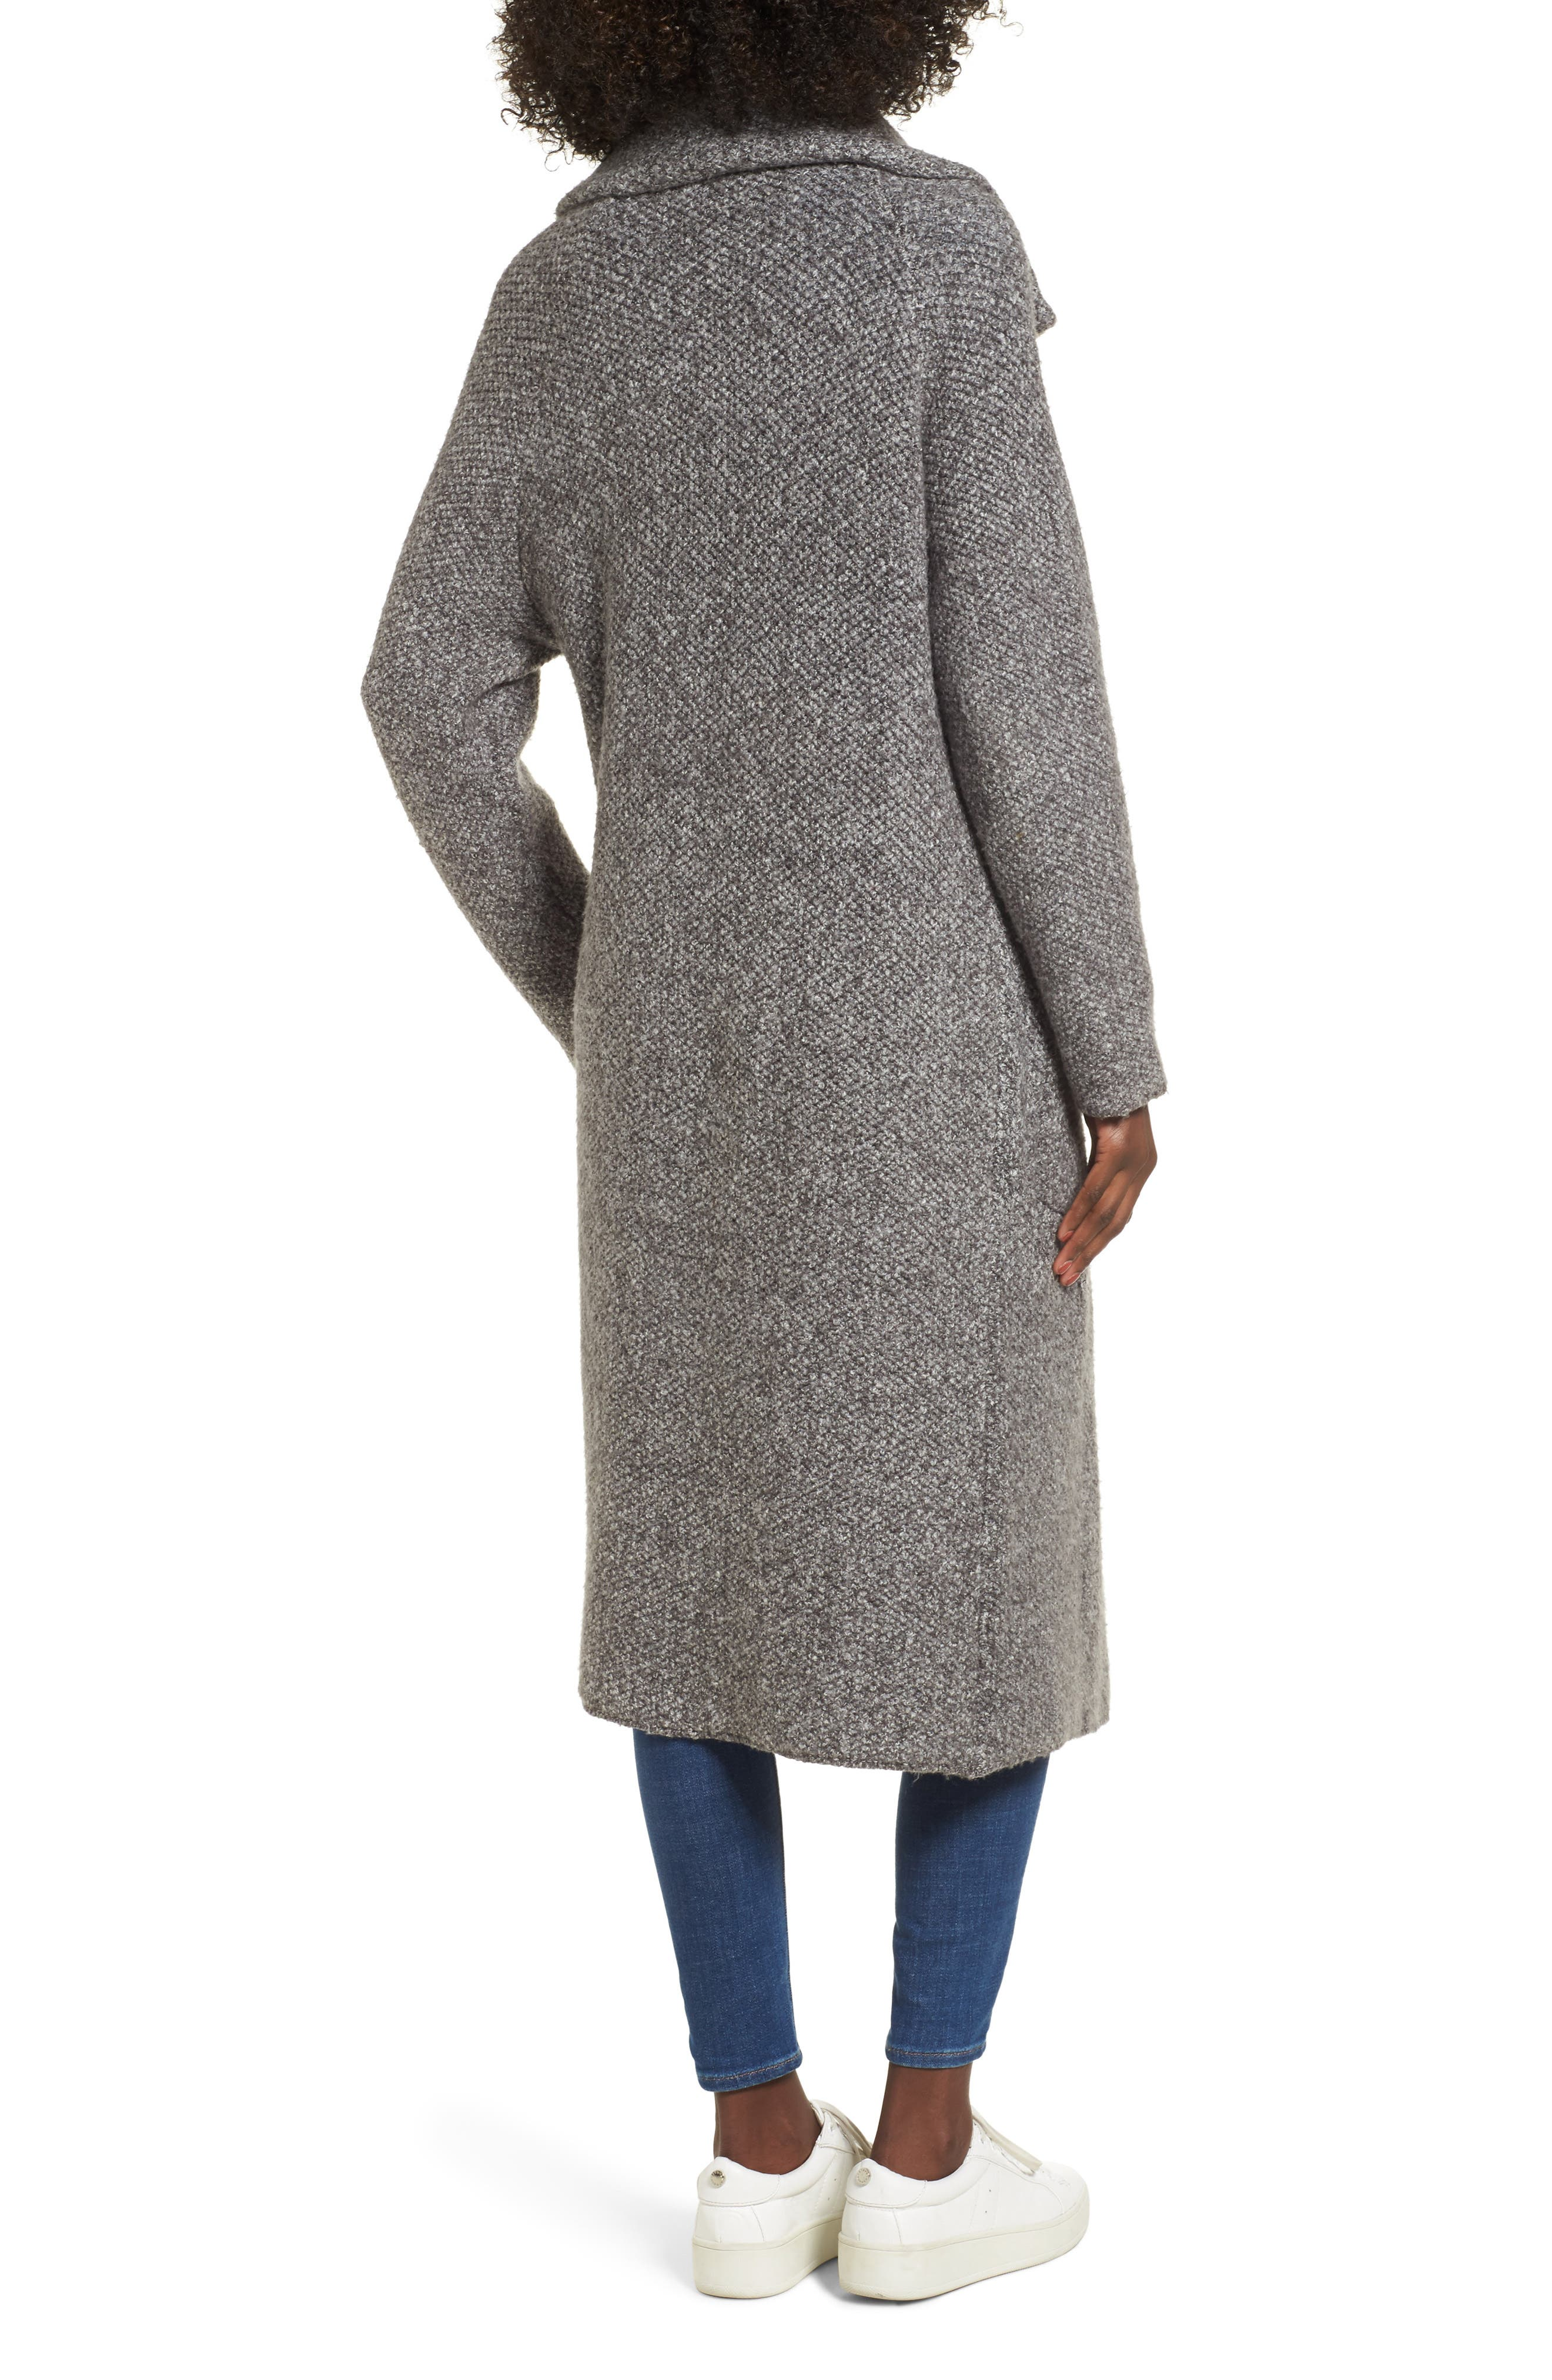 Kala Knit Sweater Jacket,                             Alternate thumbnail 2, color,                             Grey